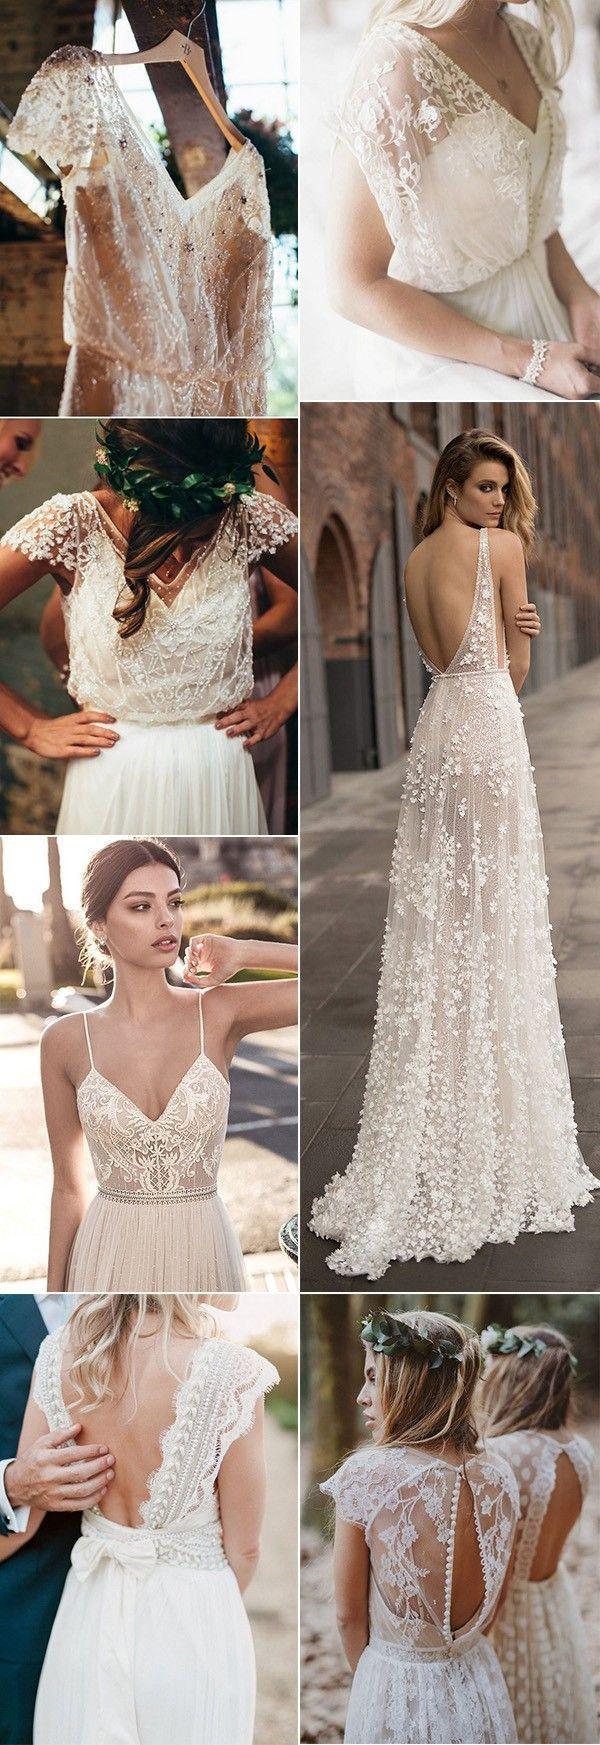 trending boho wedding dresses for 2018 #weddingdresses #weddingdress #bohowedding